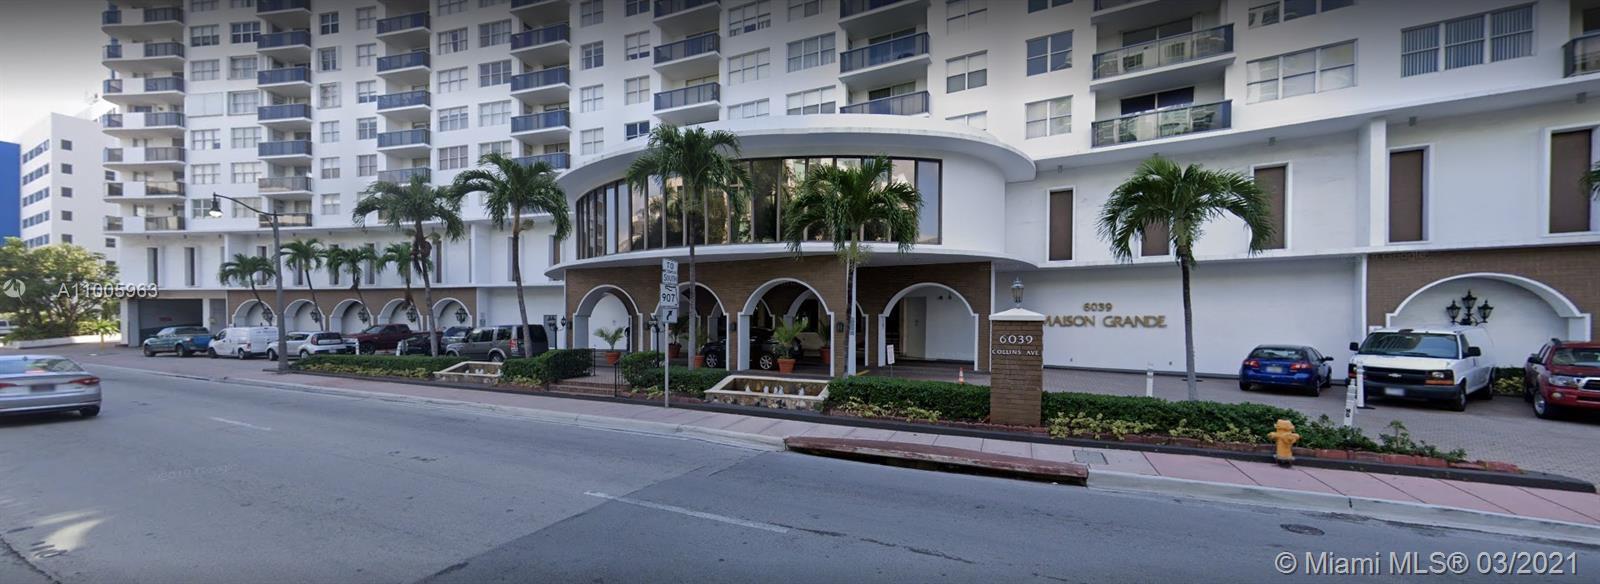 Maison Grande - Квартиры на берегу океана на продажу